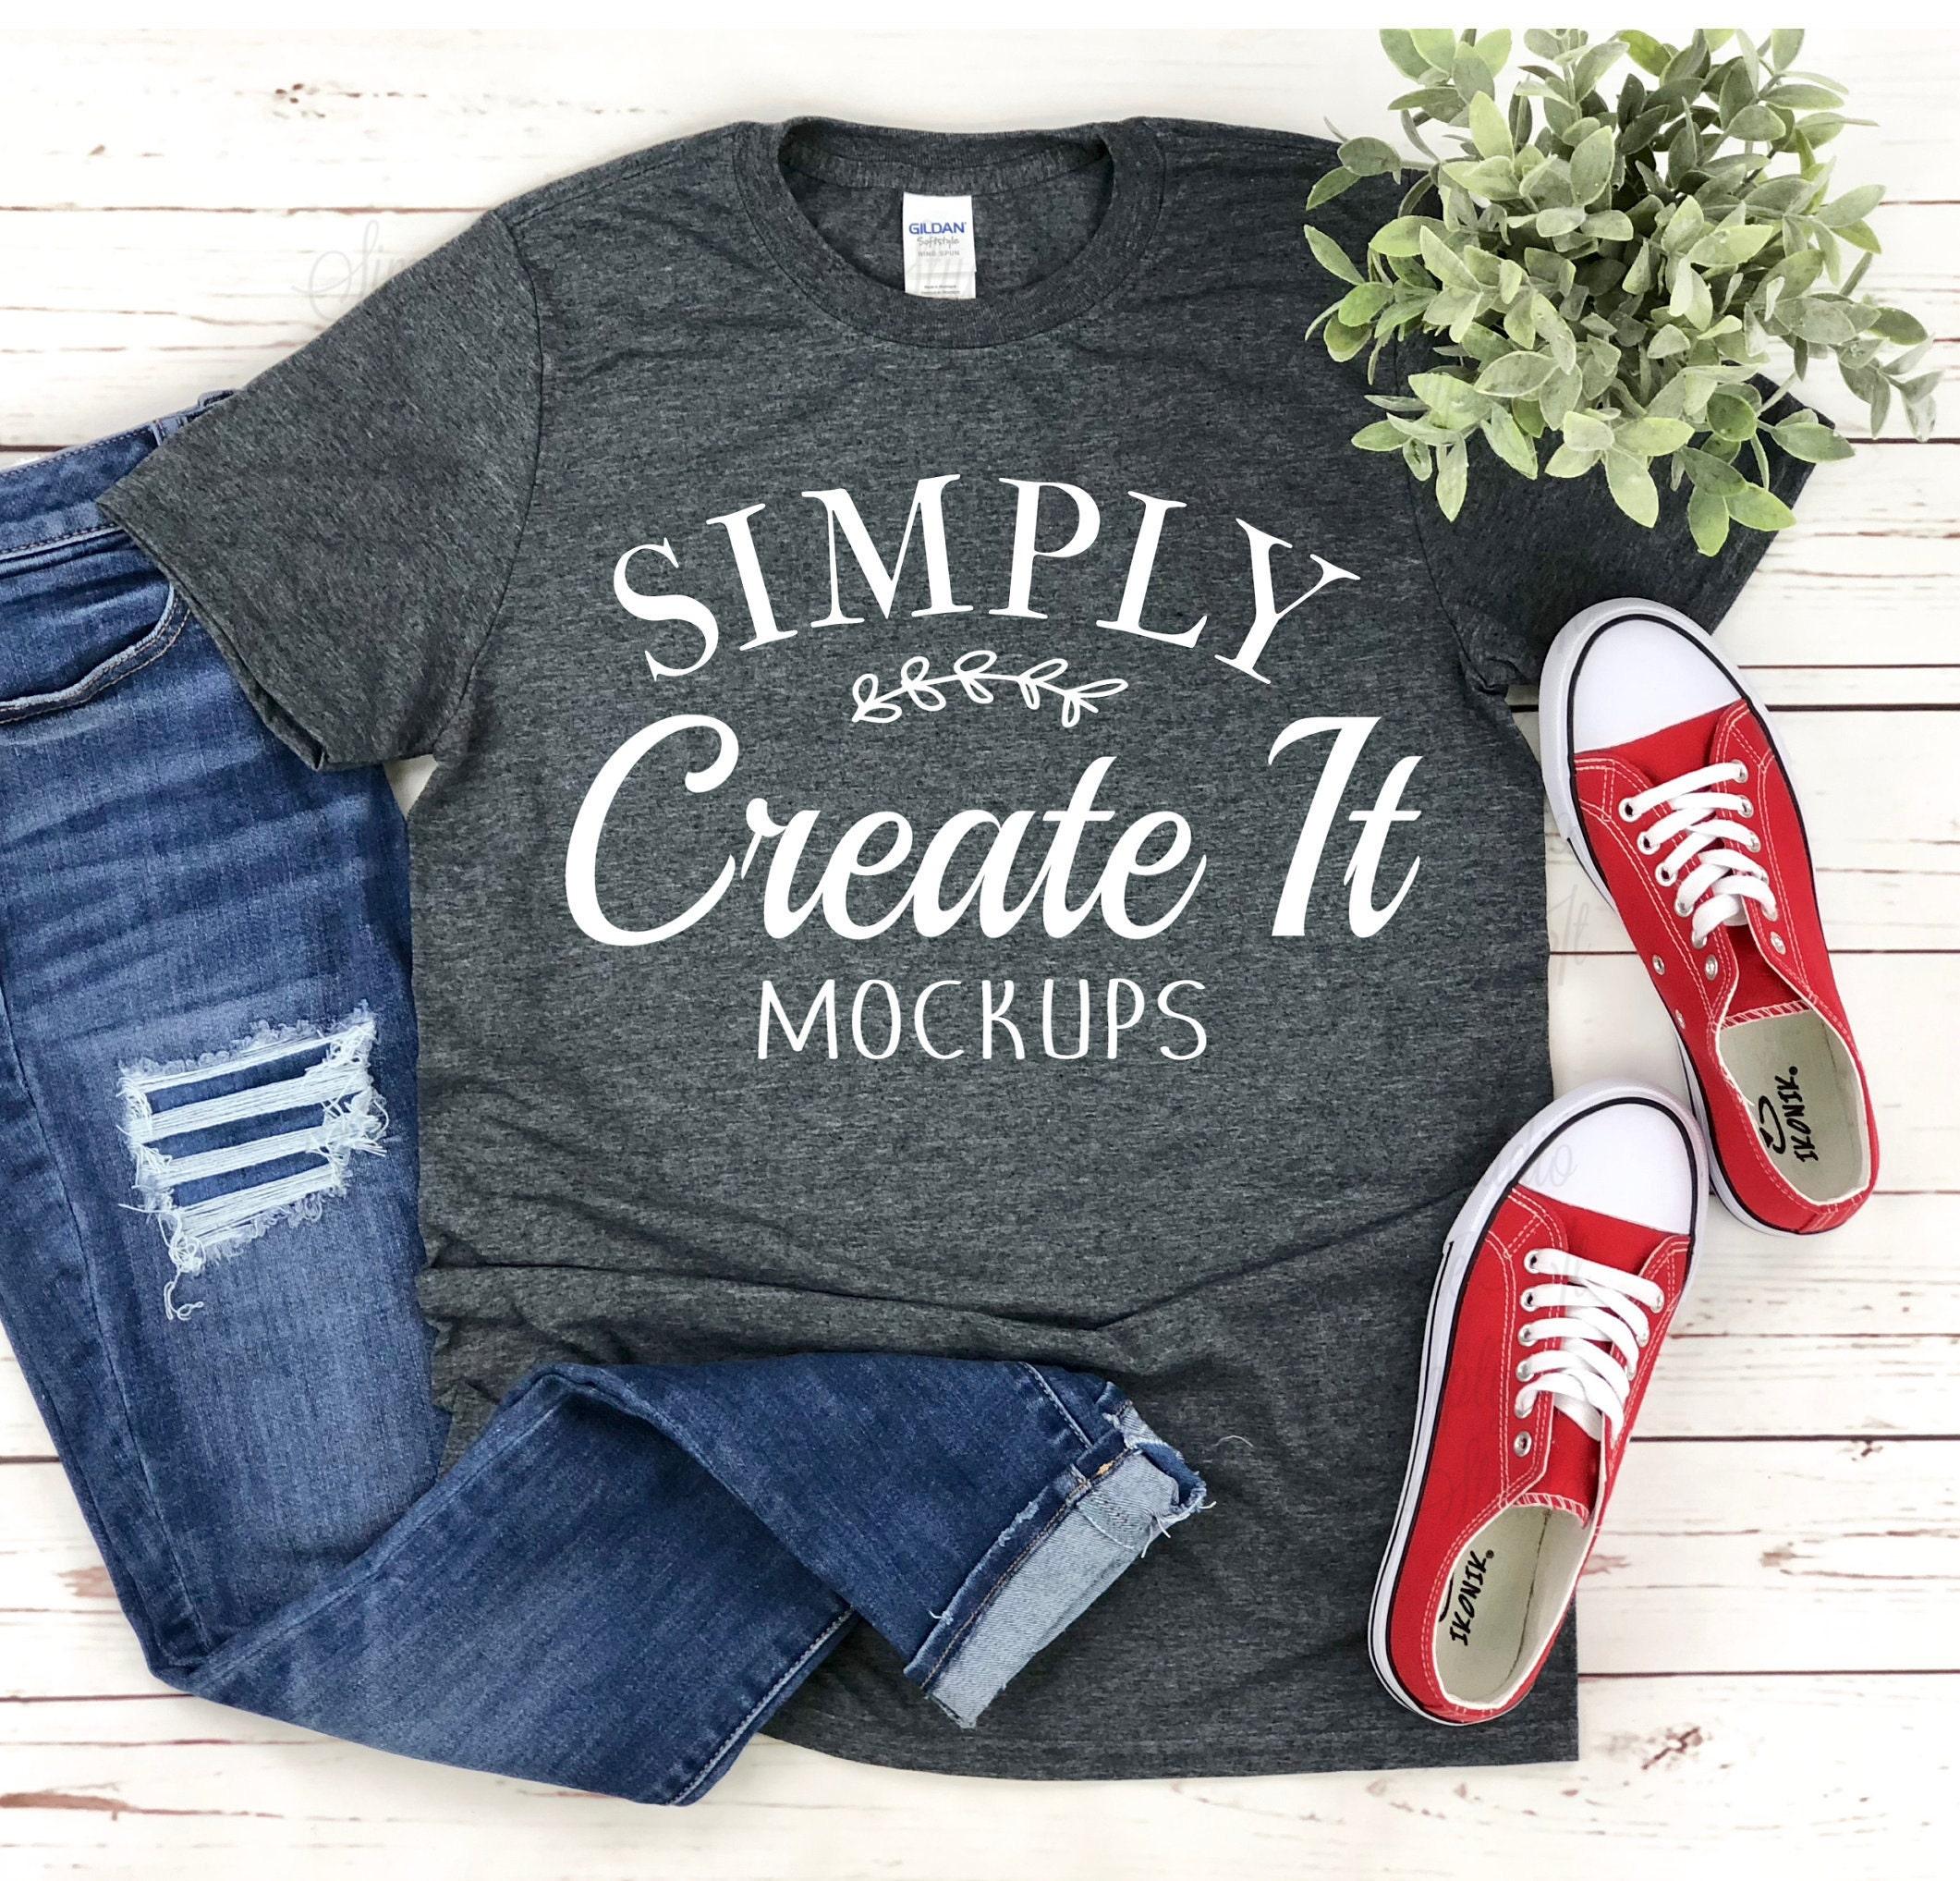 Gildan 64000 Dark Heather T-Shirt Mockup Feminine Flat Lay On Trendy Patterned Abstract Background Shoes /& Purse Fashion Blog Mockup